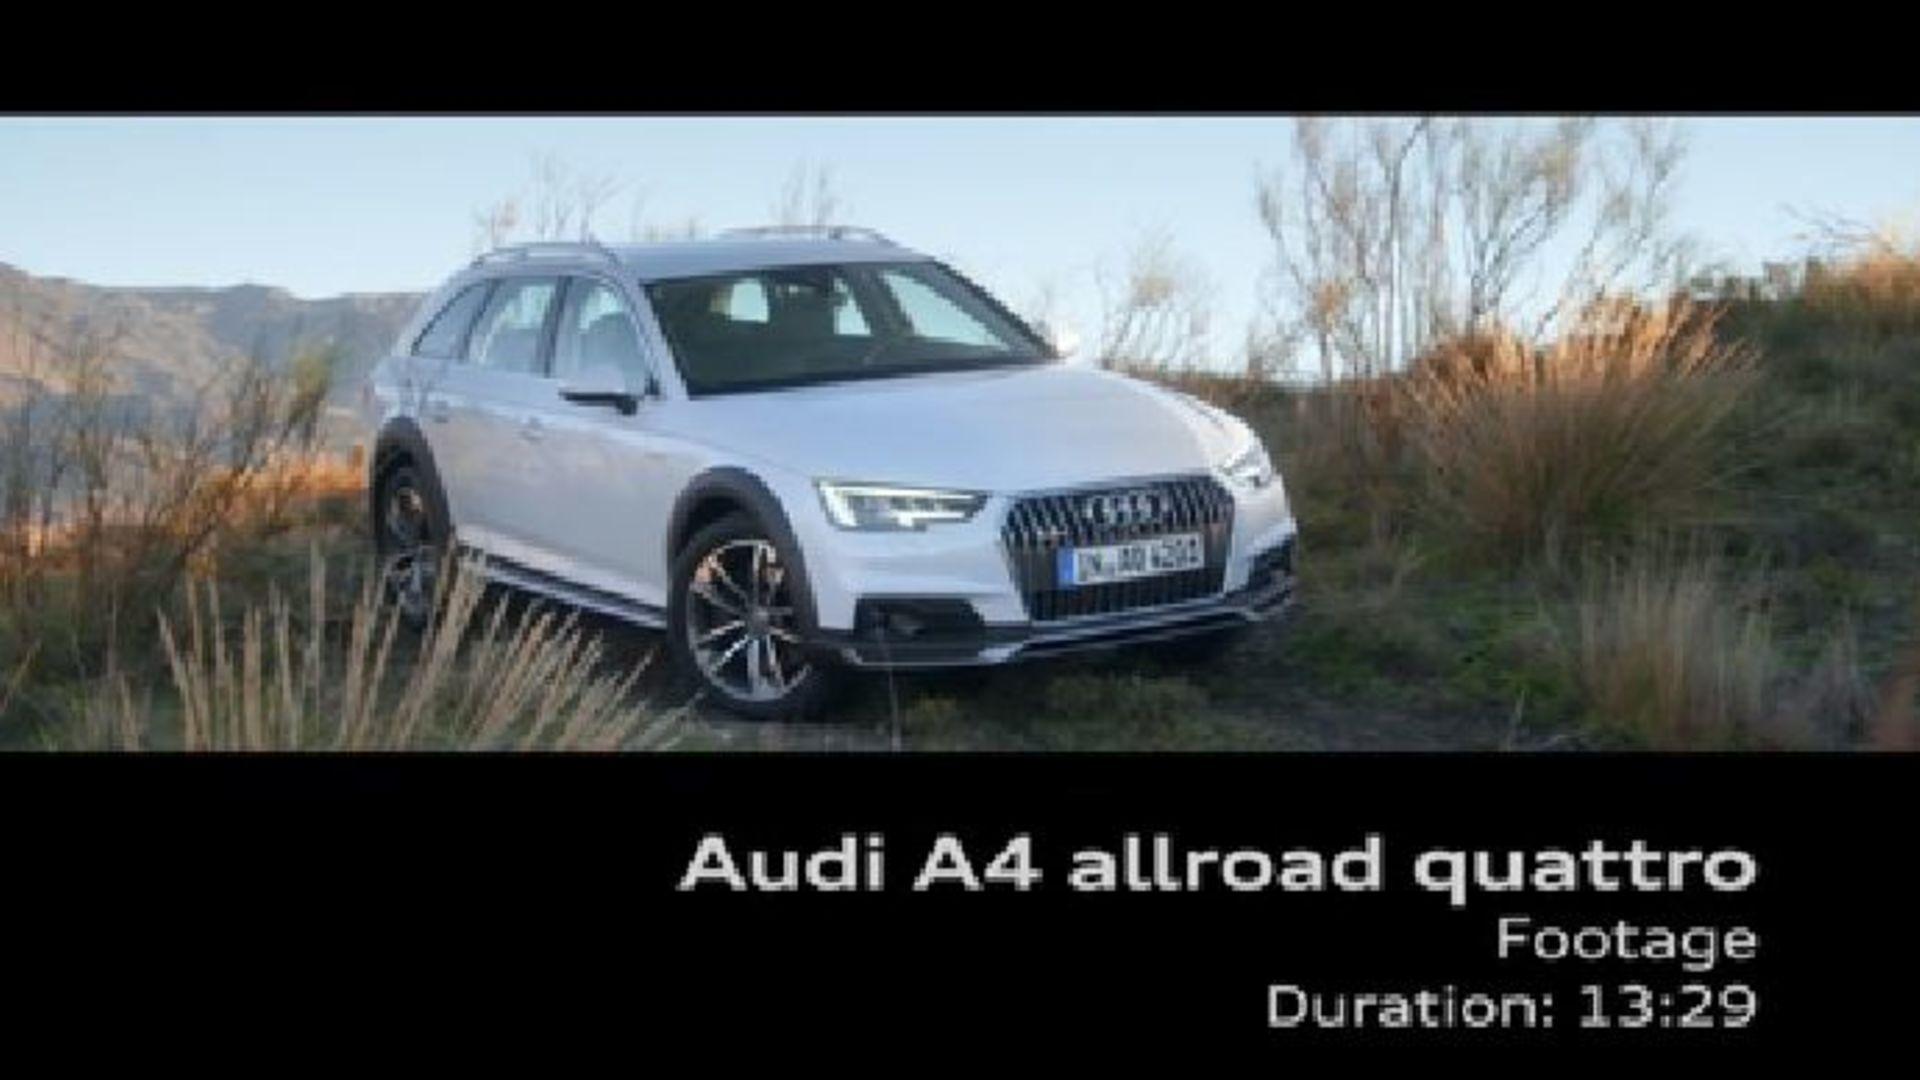 Audi A4 allroad quattro - Footage